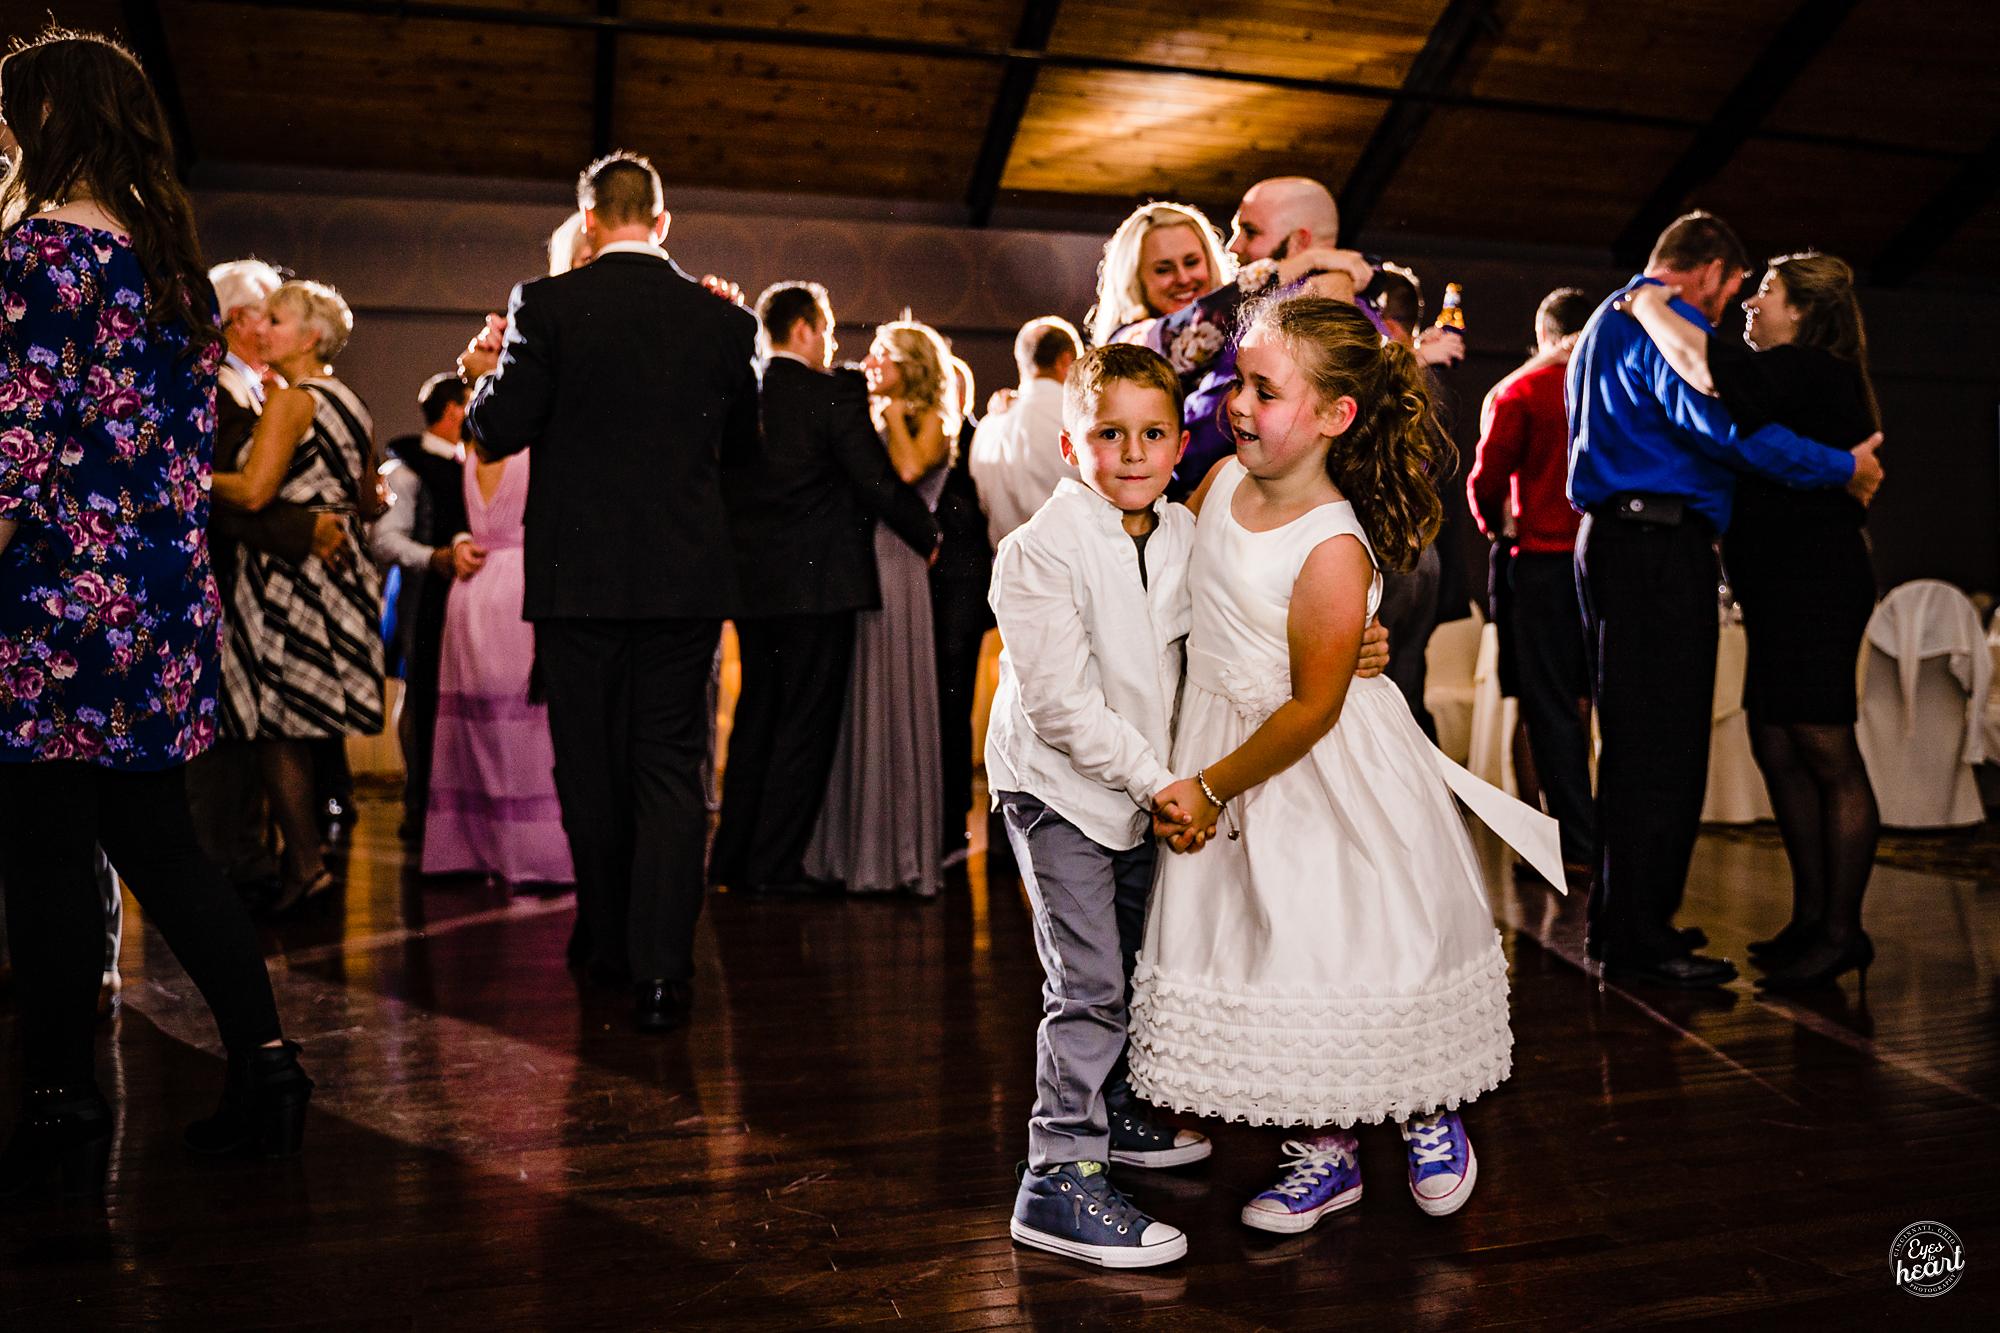 The-Pinnacle-Ballroom-Covington-KY-Wedding-Photography-25.jpg